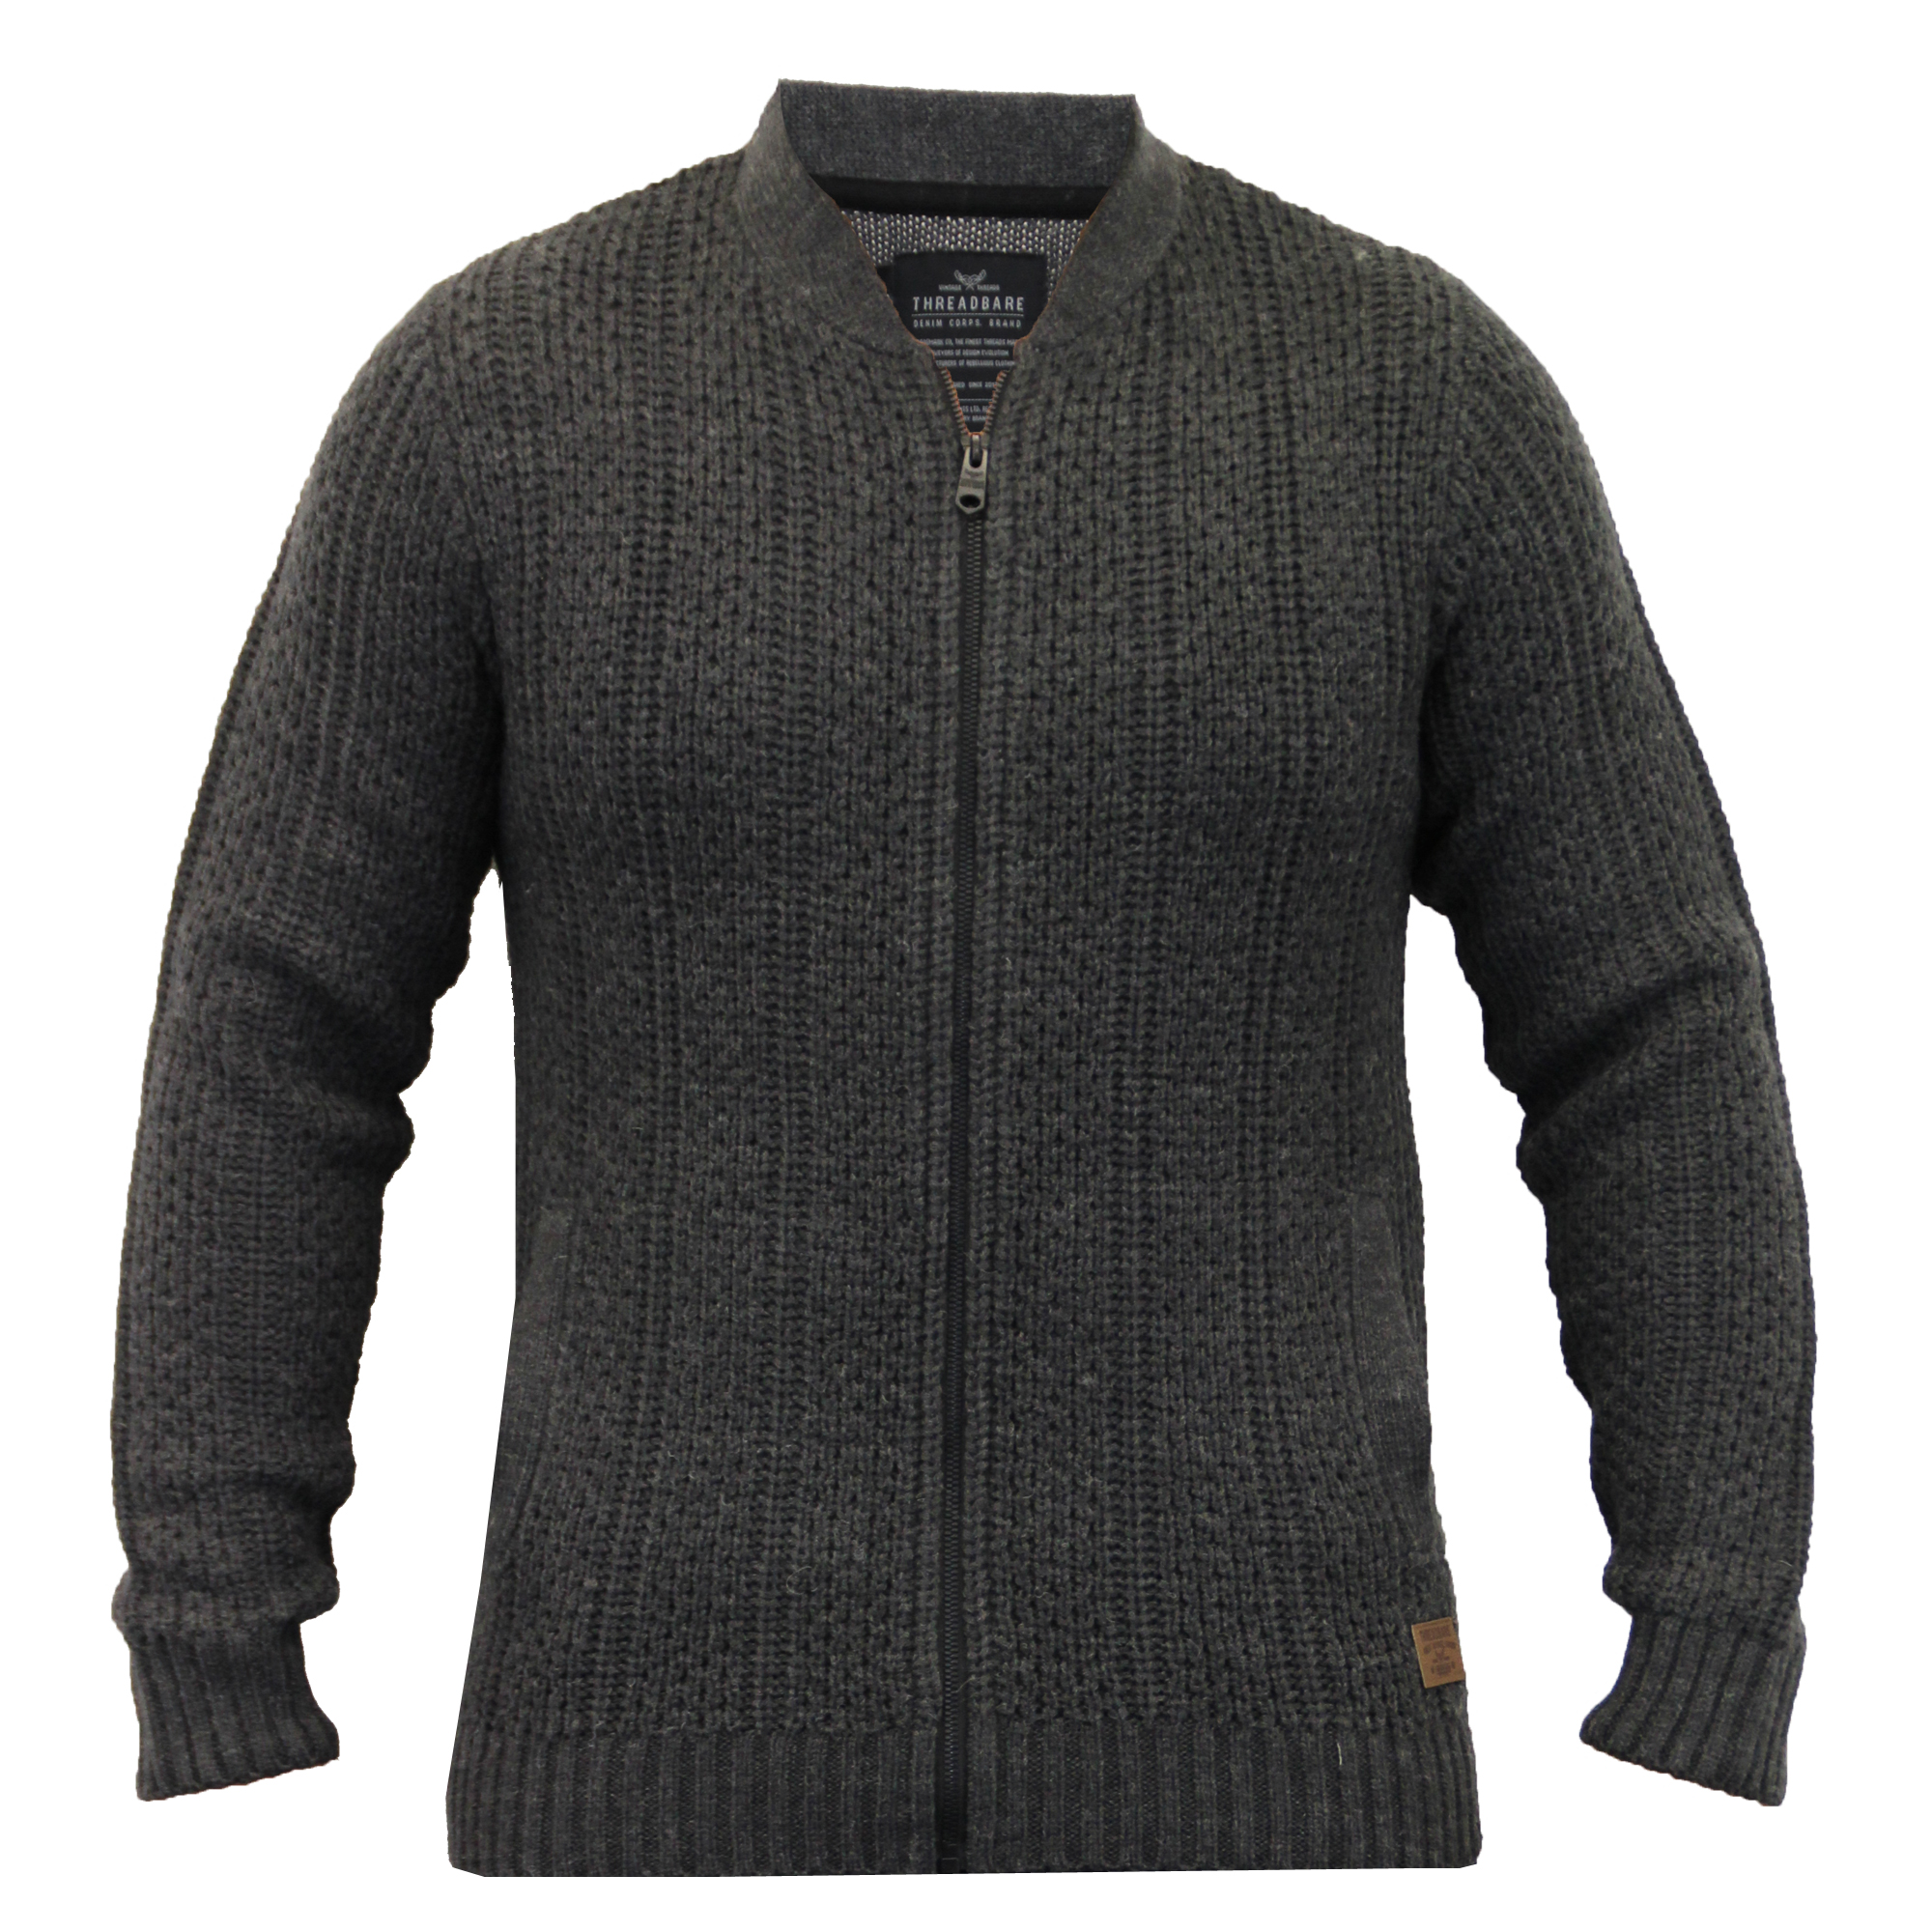 Mens-Wool-Mix-Cardigans-Threadbare-Knitted-Sweater-Broken-Standard-Shawl-Winter thumbnail 8